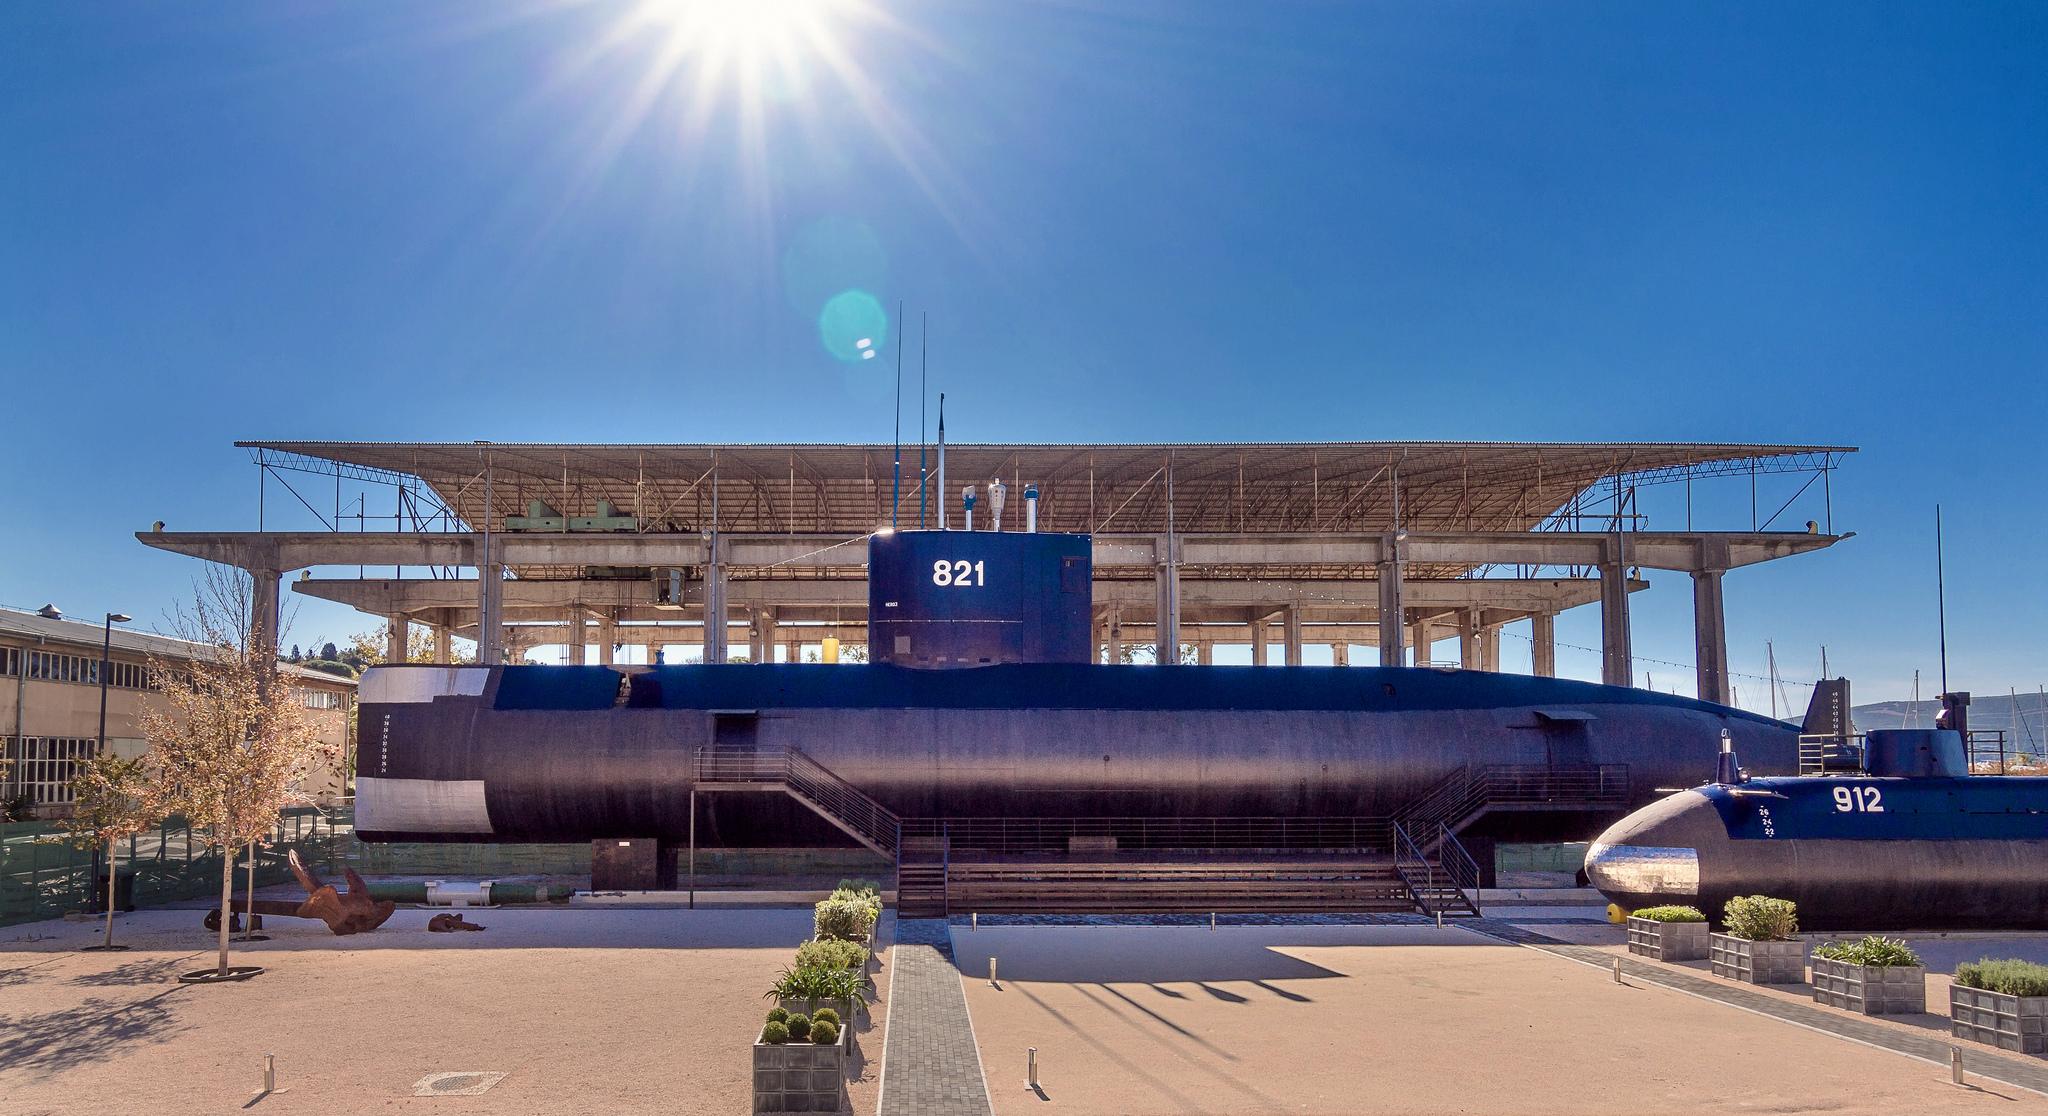 naval-heritage-collection-museum-porto-montenegro-porto-montenegro-offical-site